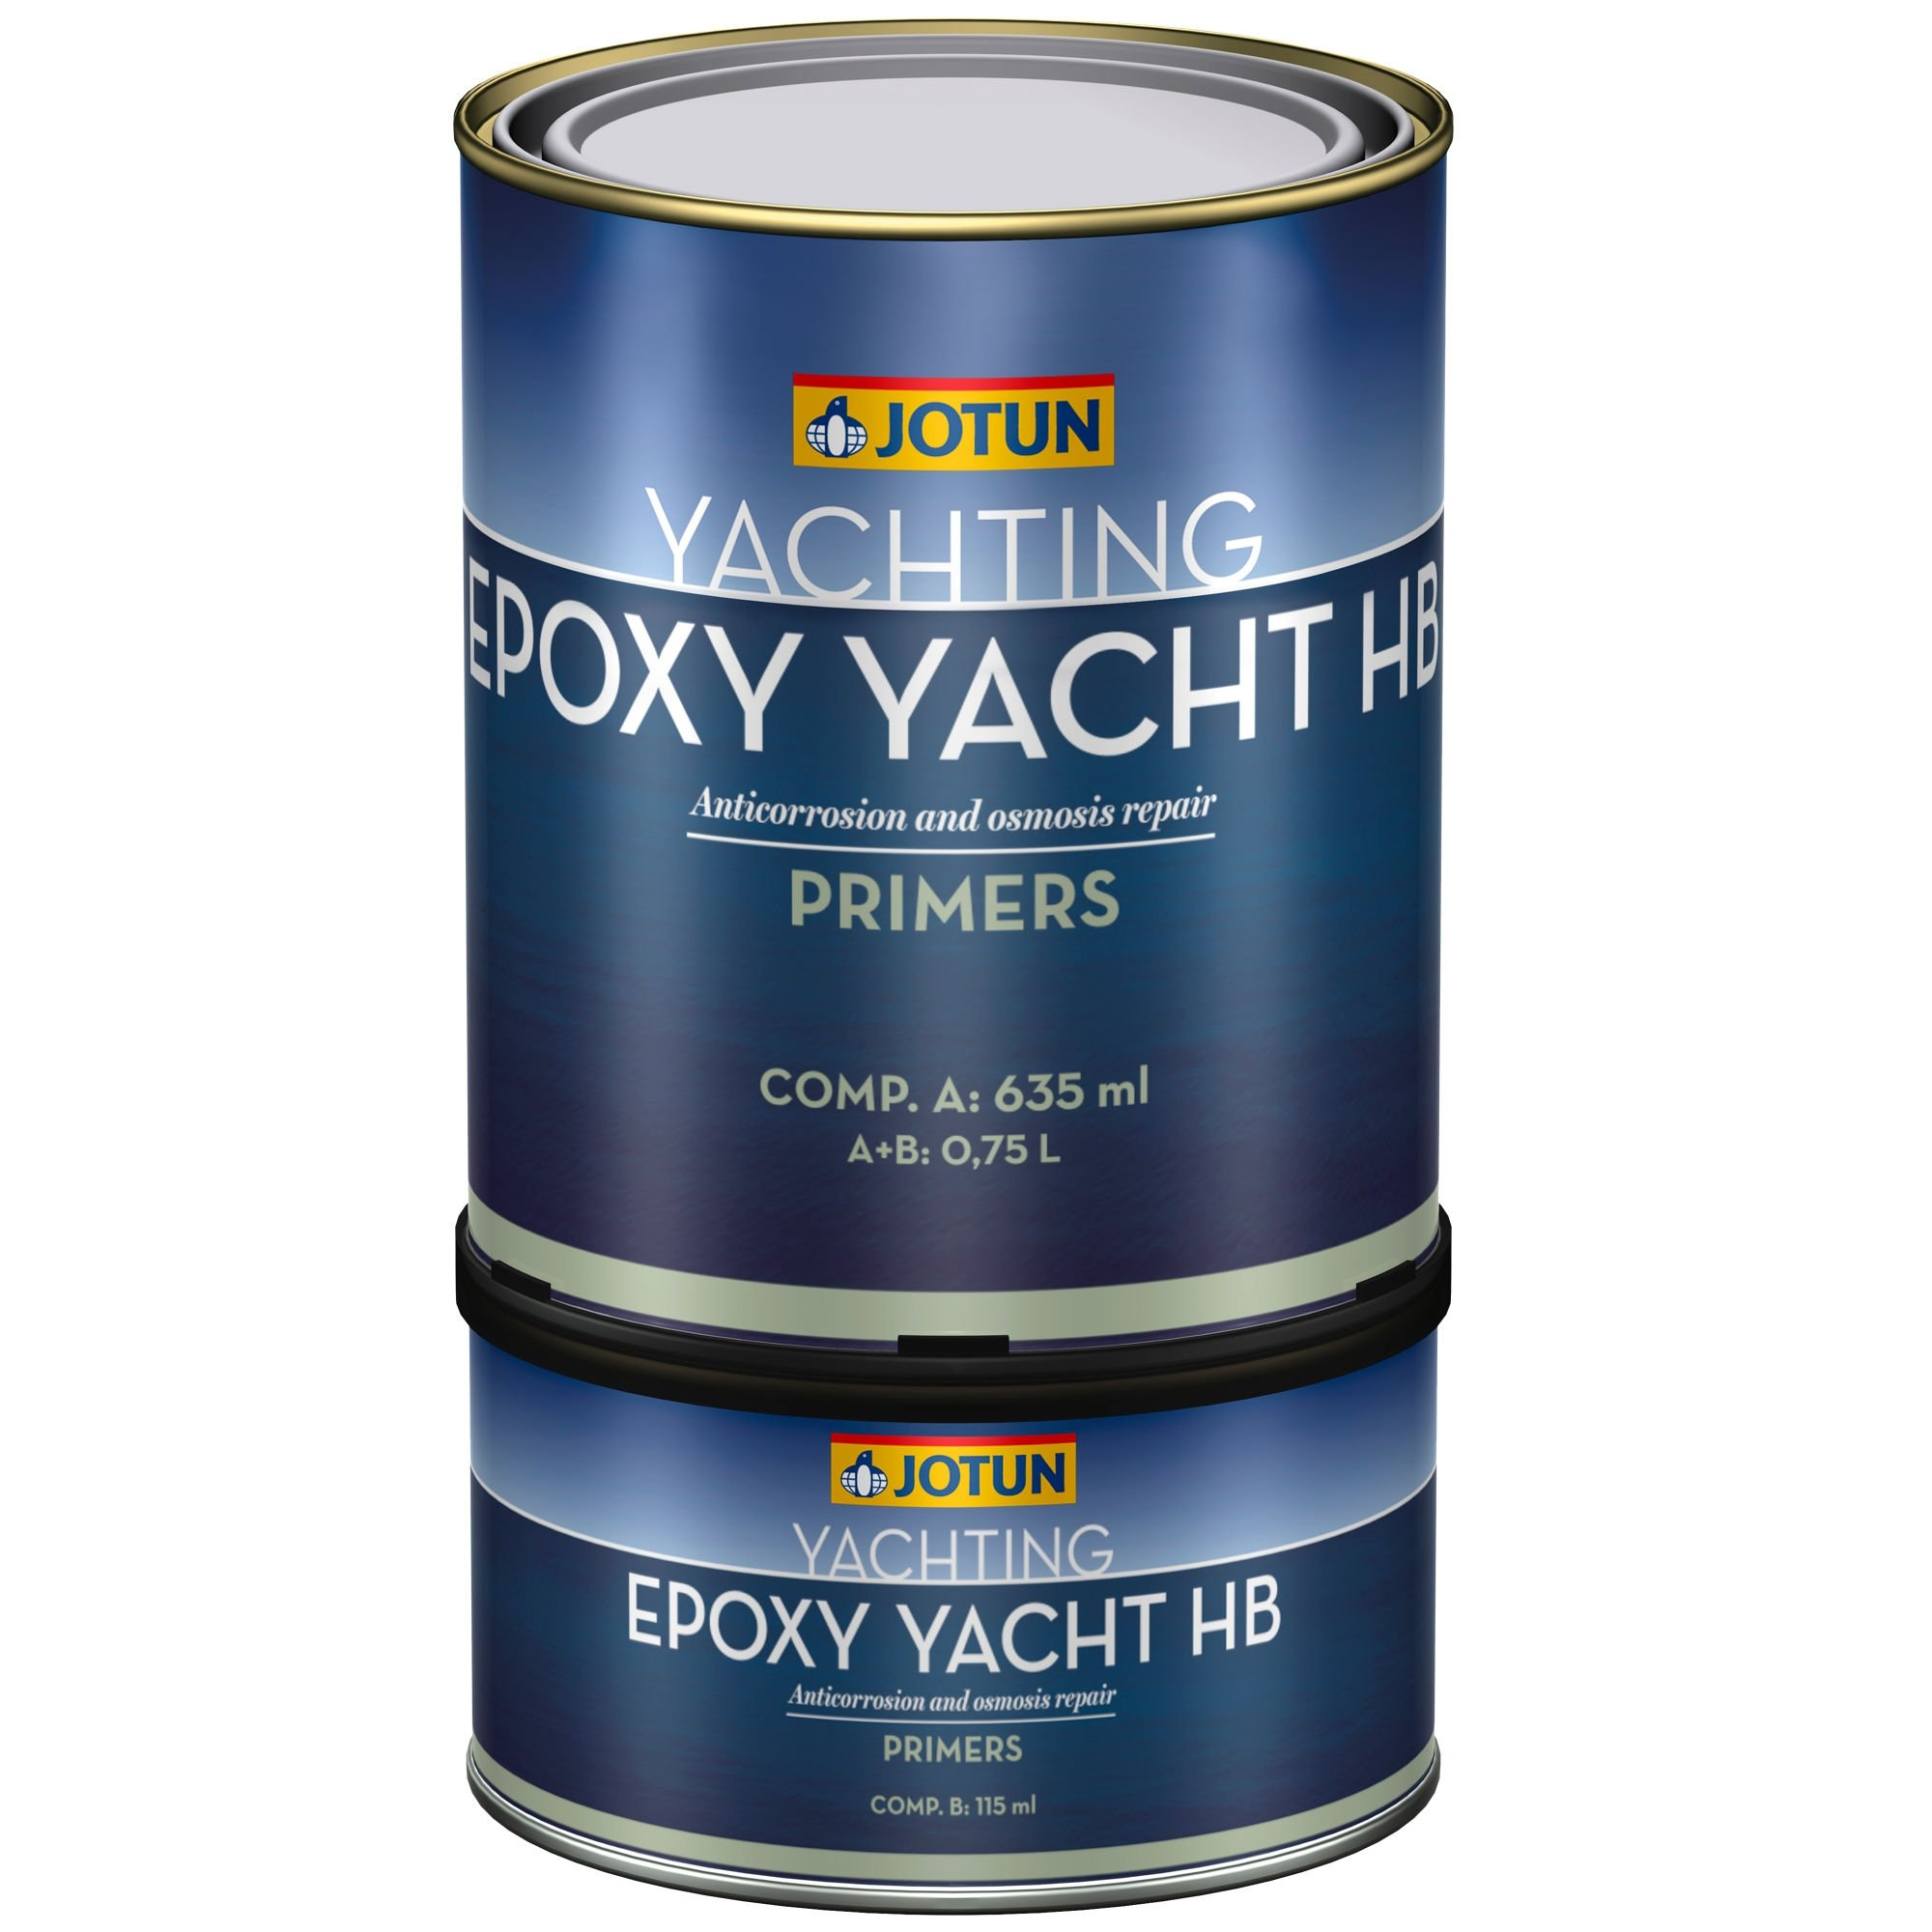 Yachting Epoxy Yacht HB